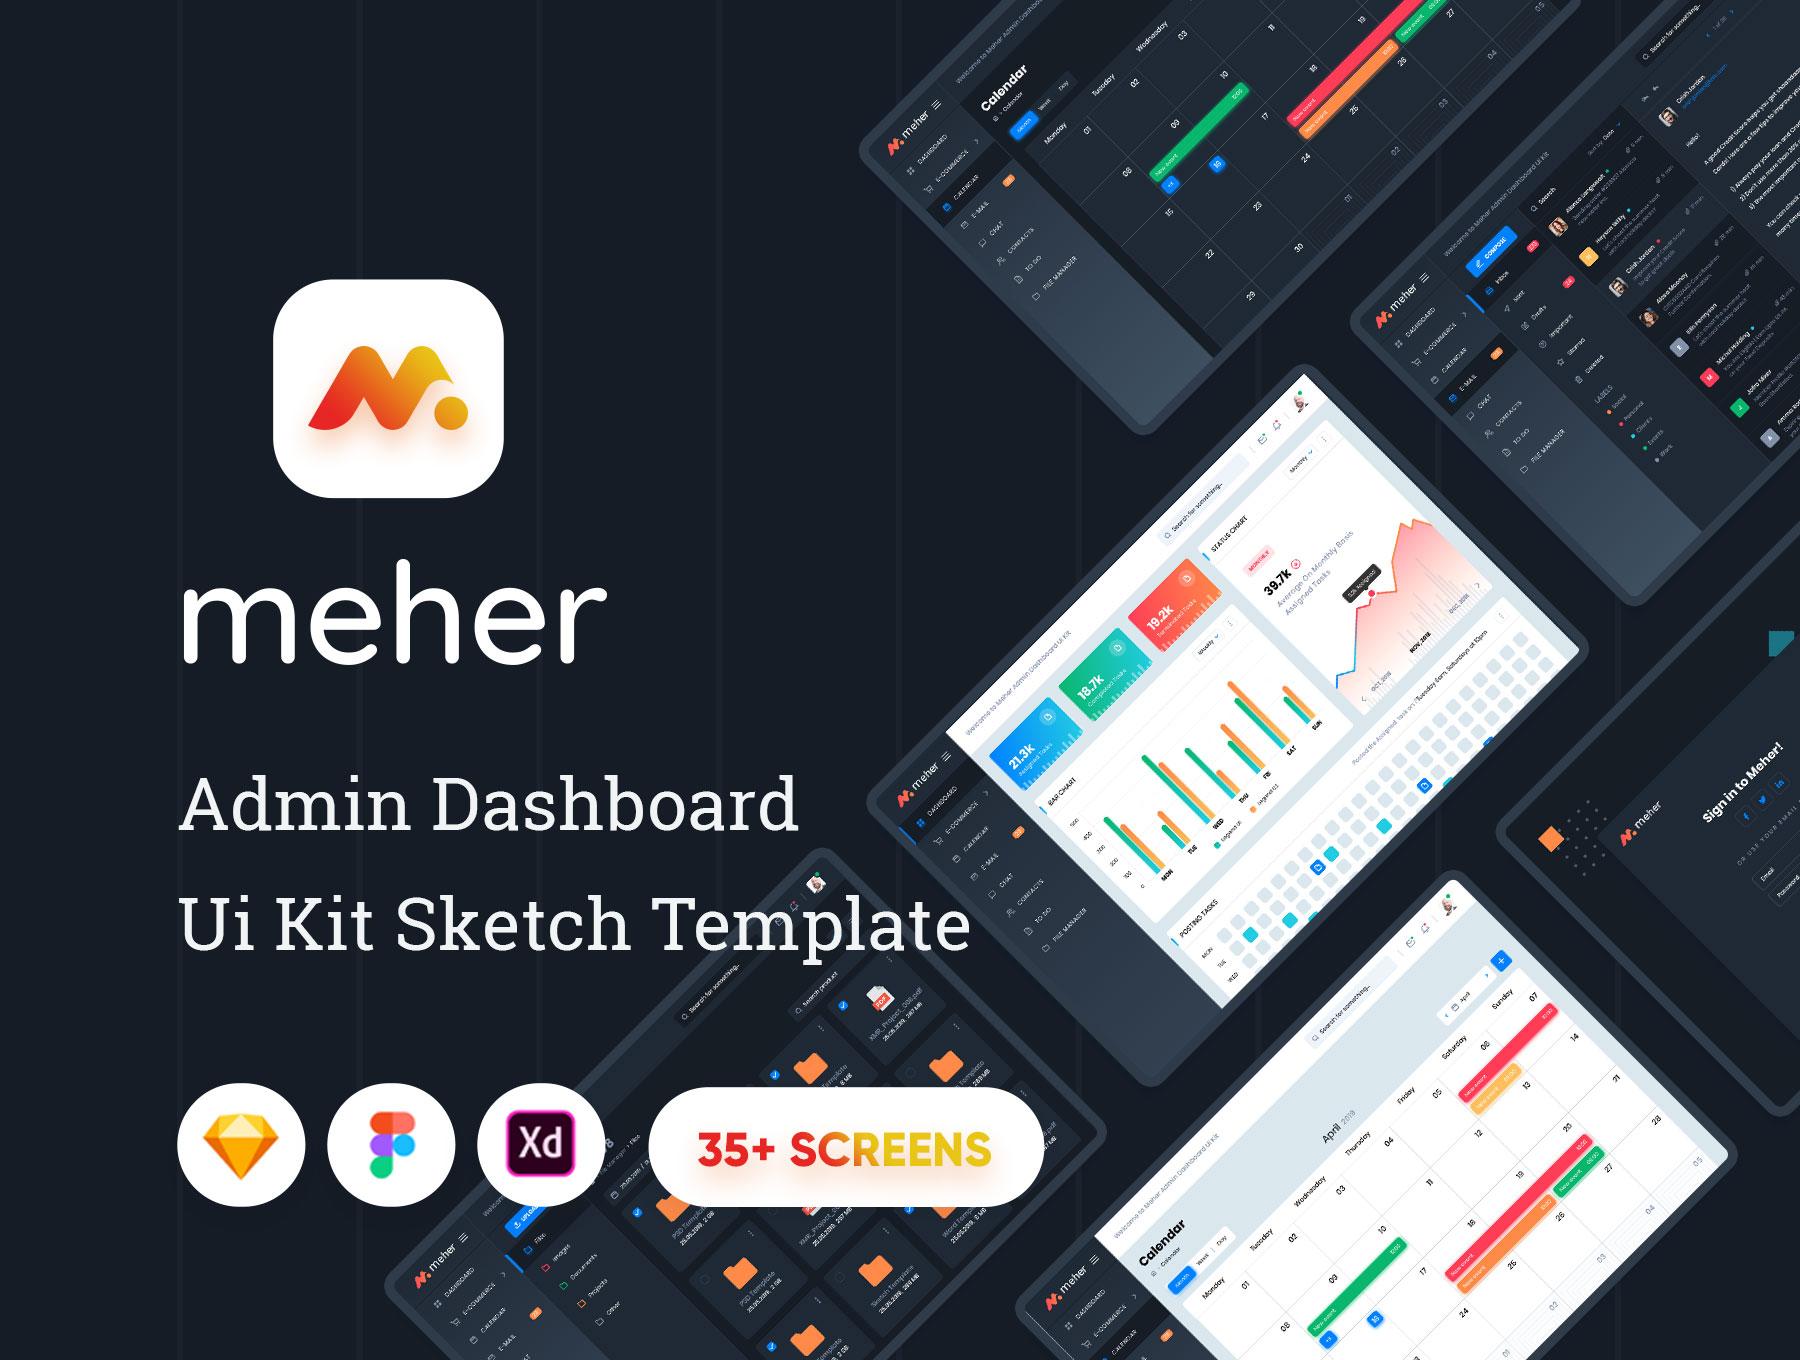 网站后台管理仪表板UI界面设计Sketch模板 Meher – Admin Dashboard Ui Kit Sketch Template插图